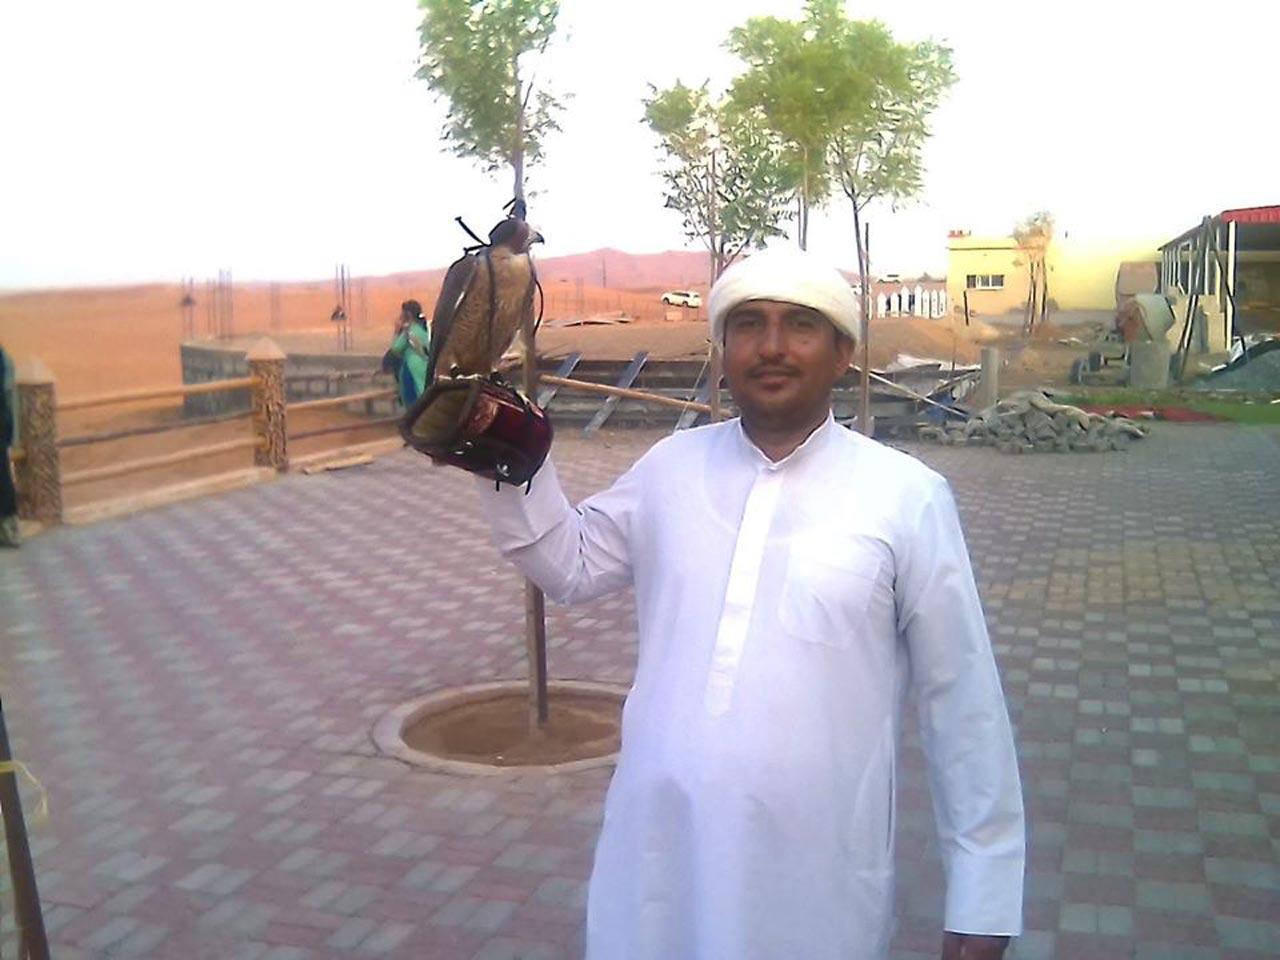 Golden Falcon with Abdullah near Omani border, United Arab Emirates. Photo by Mihir Manek.